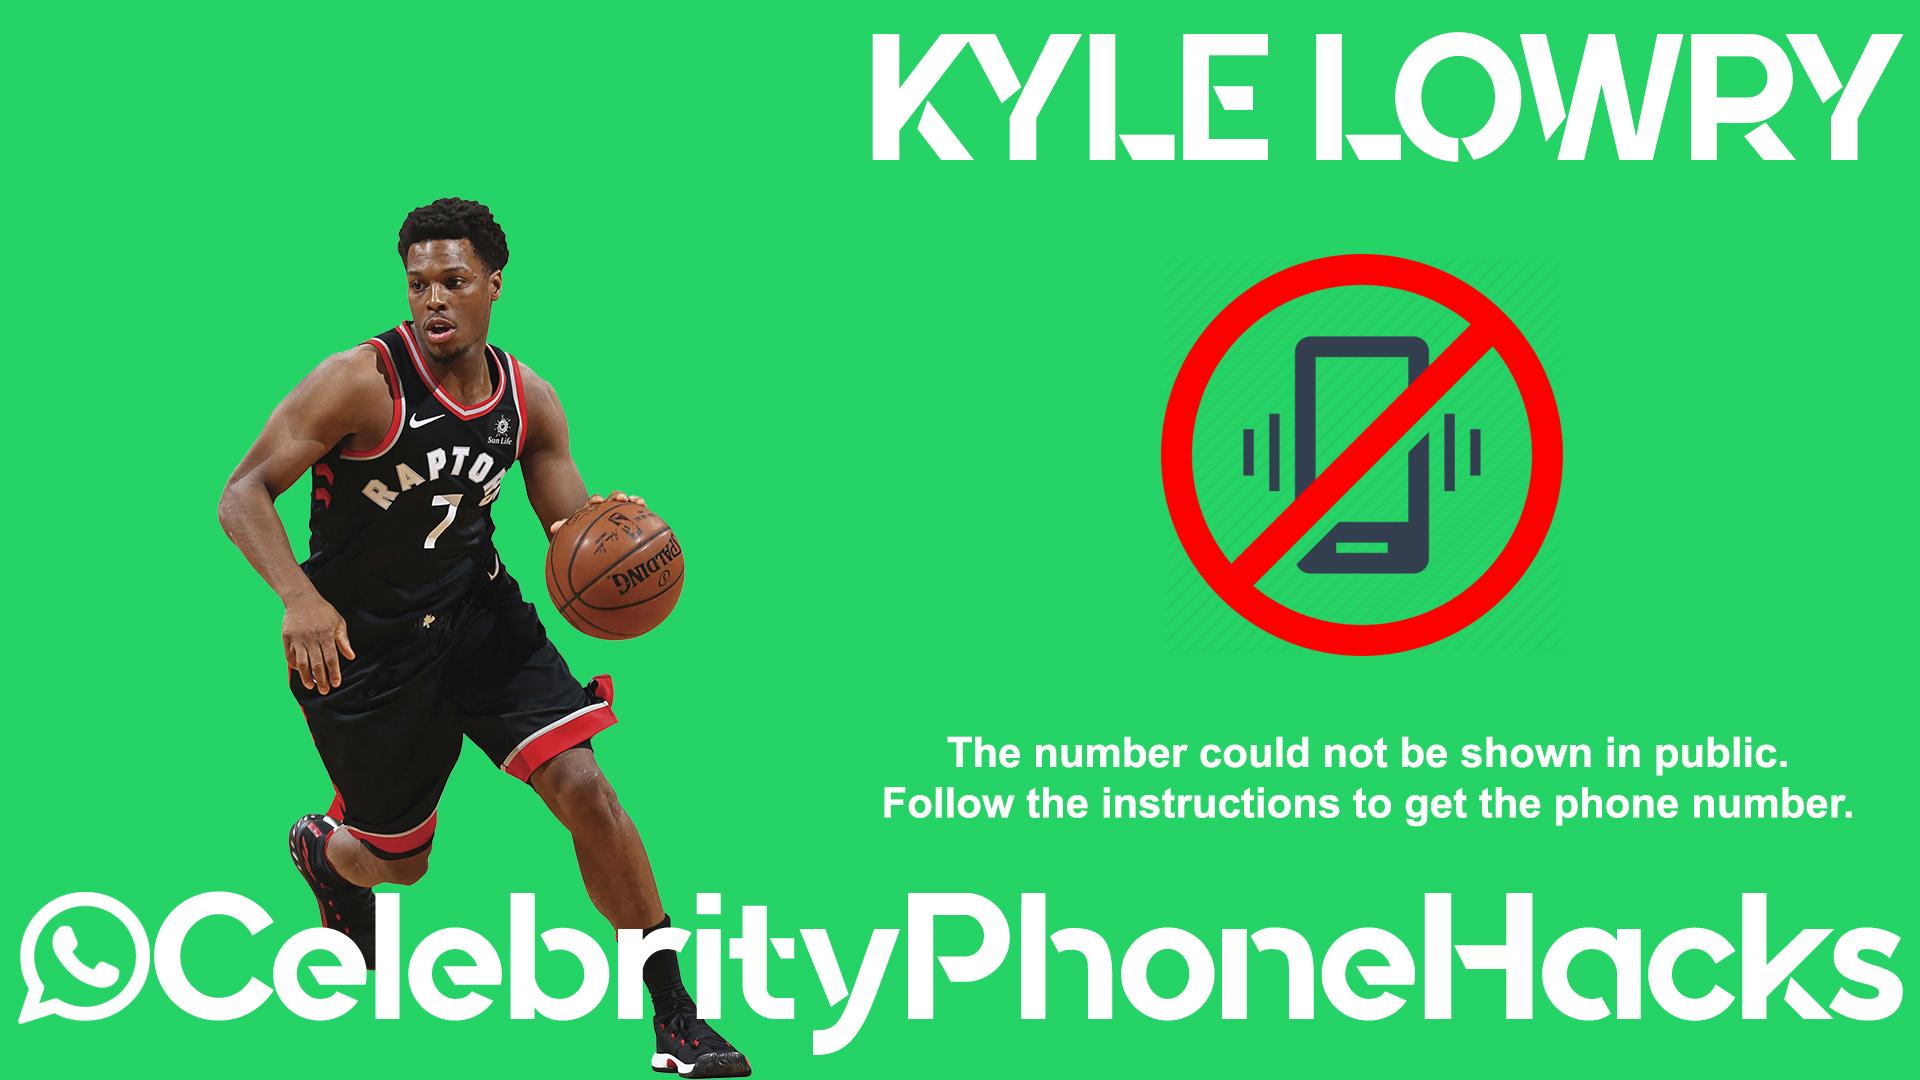 Kyle Lowry real phone number 2019 whatsapp hacked leaked